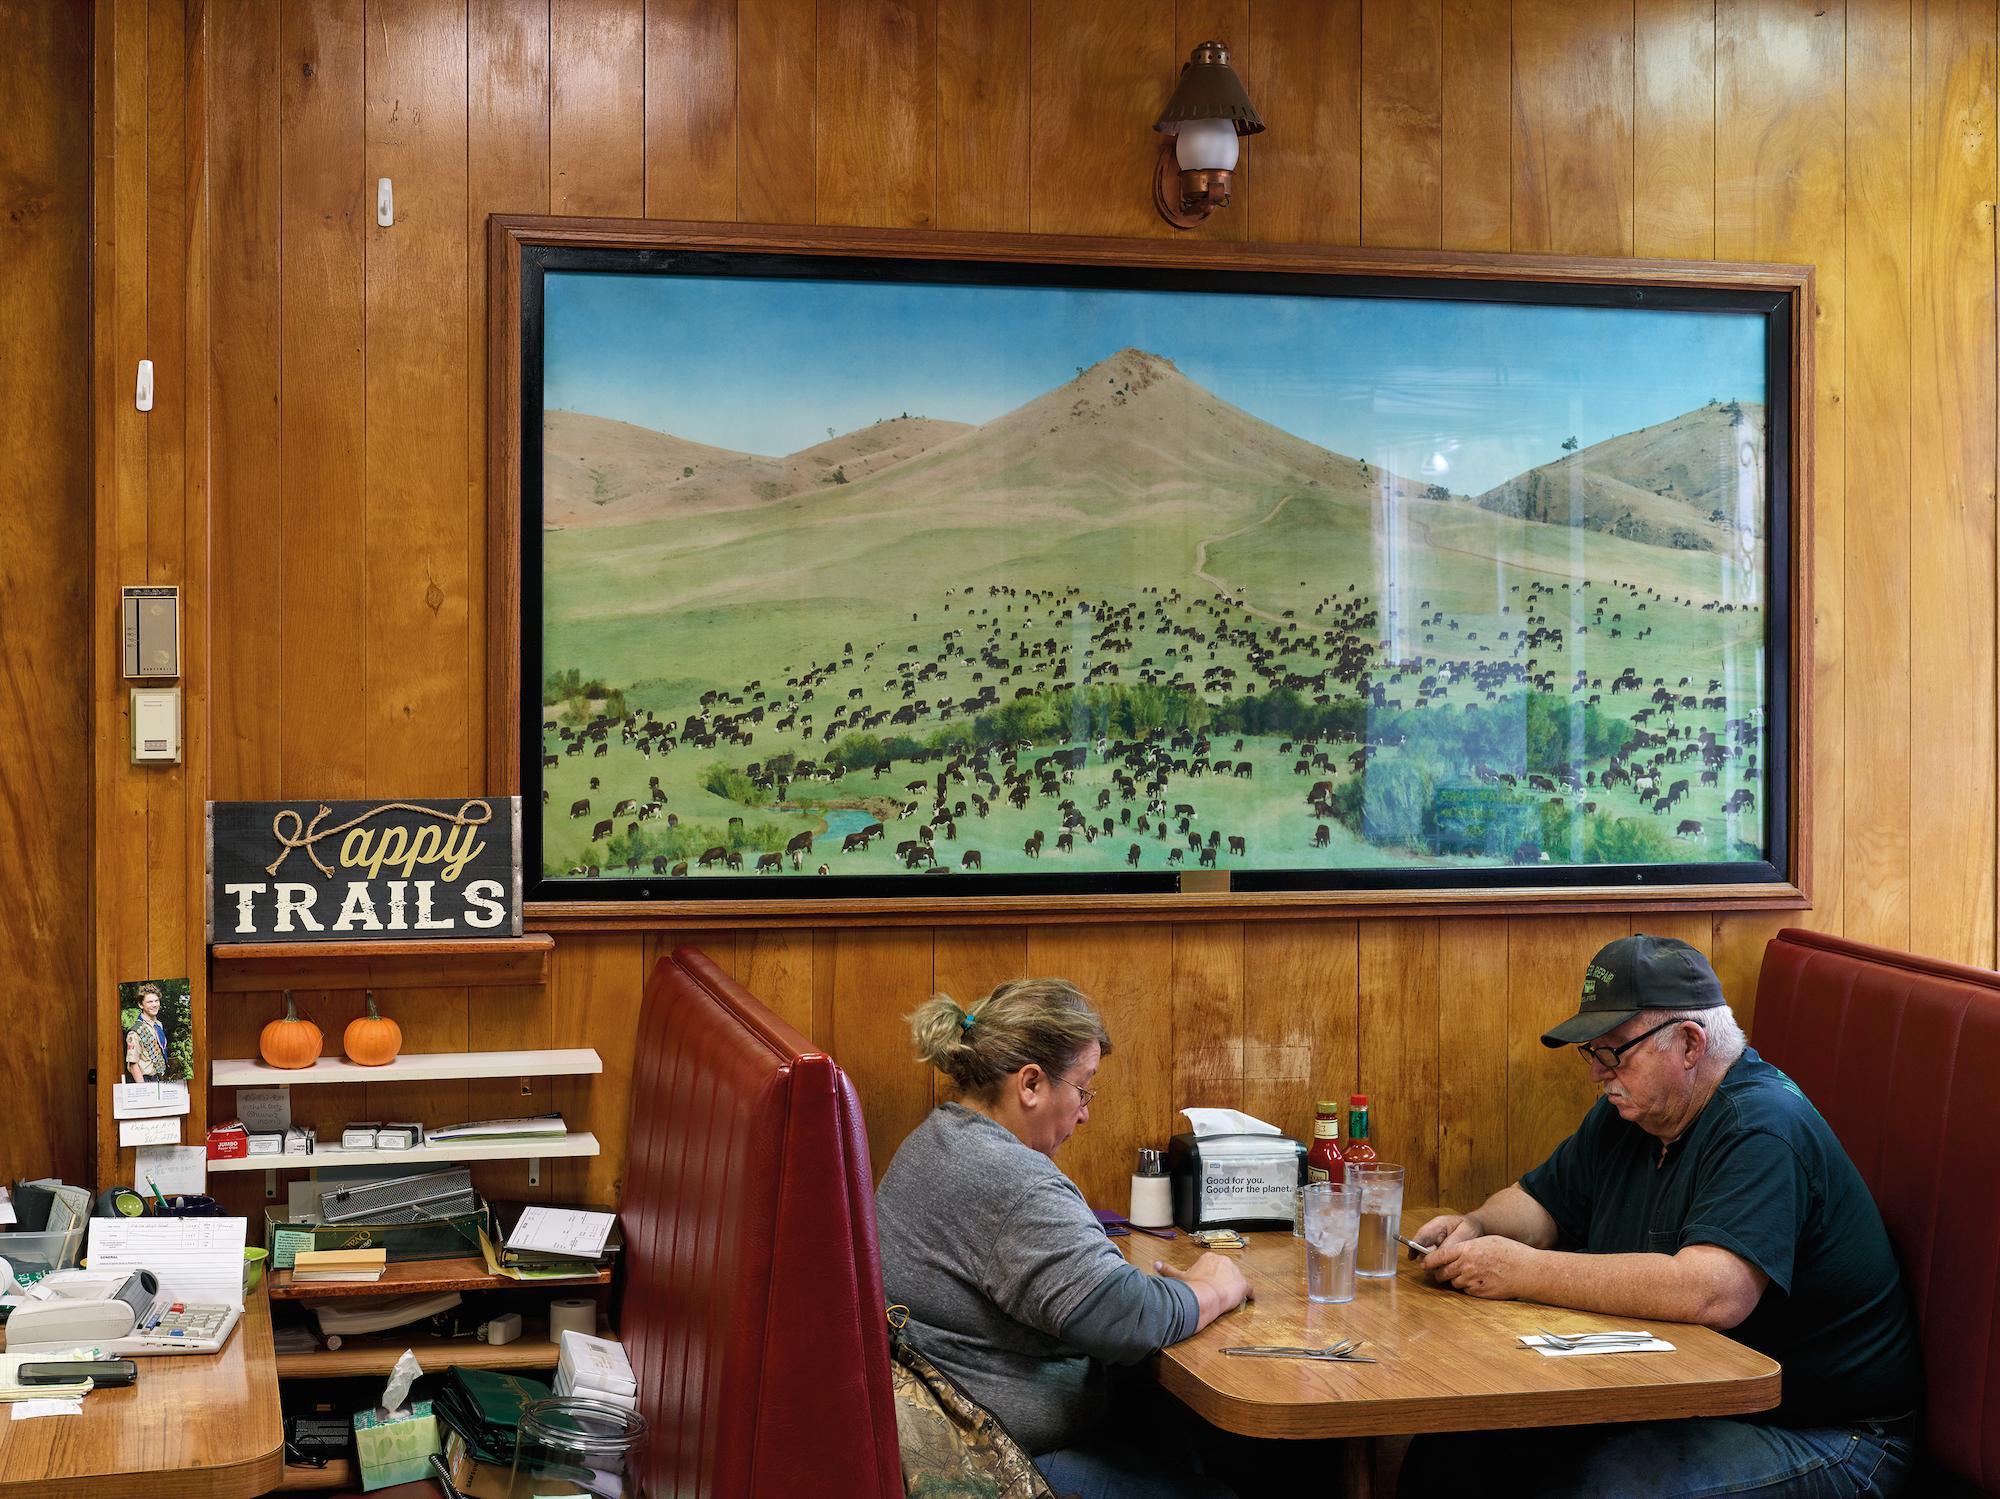 600 Cafe, Miles City, Montana 10.2018 © Mark Power / Magnum Photos